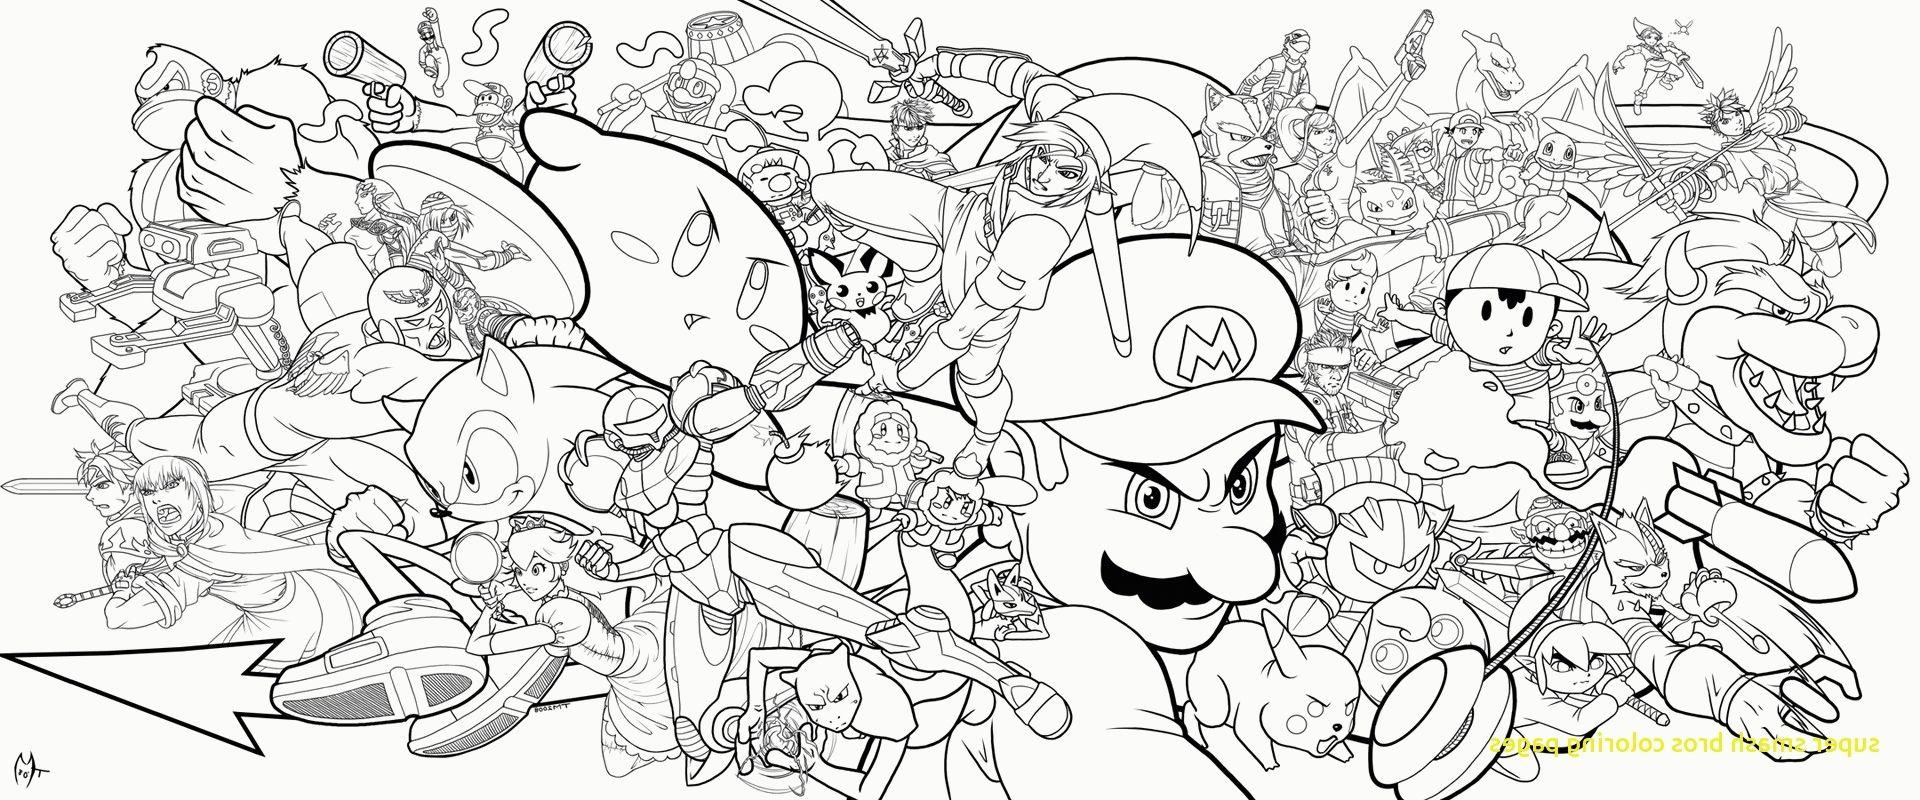 Super Smash Bros Coloring Pages Coloring Page Super